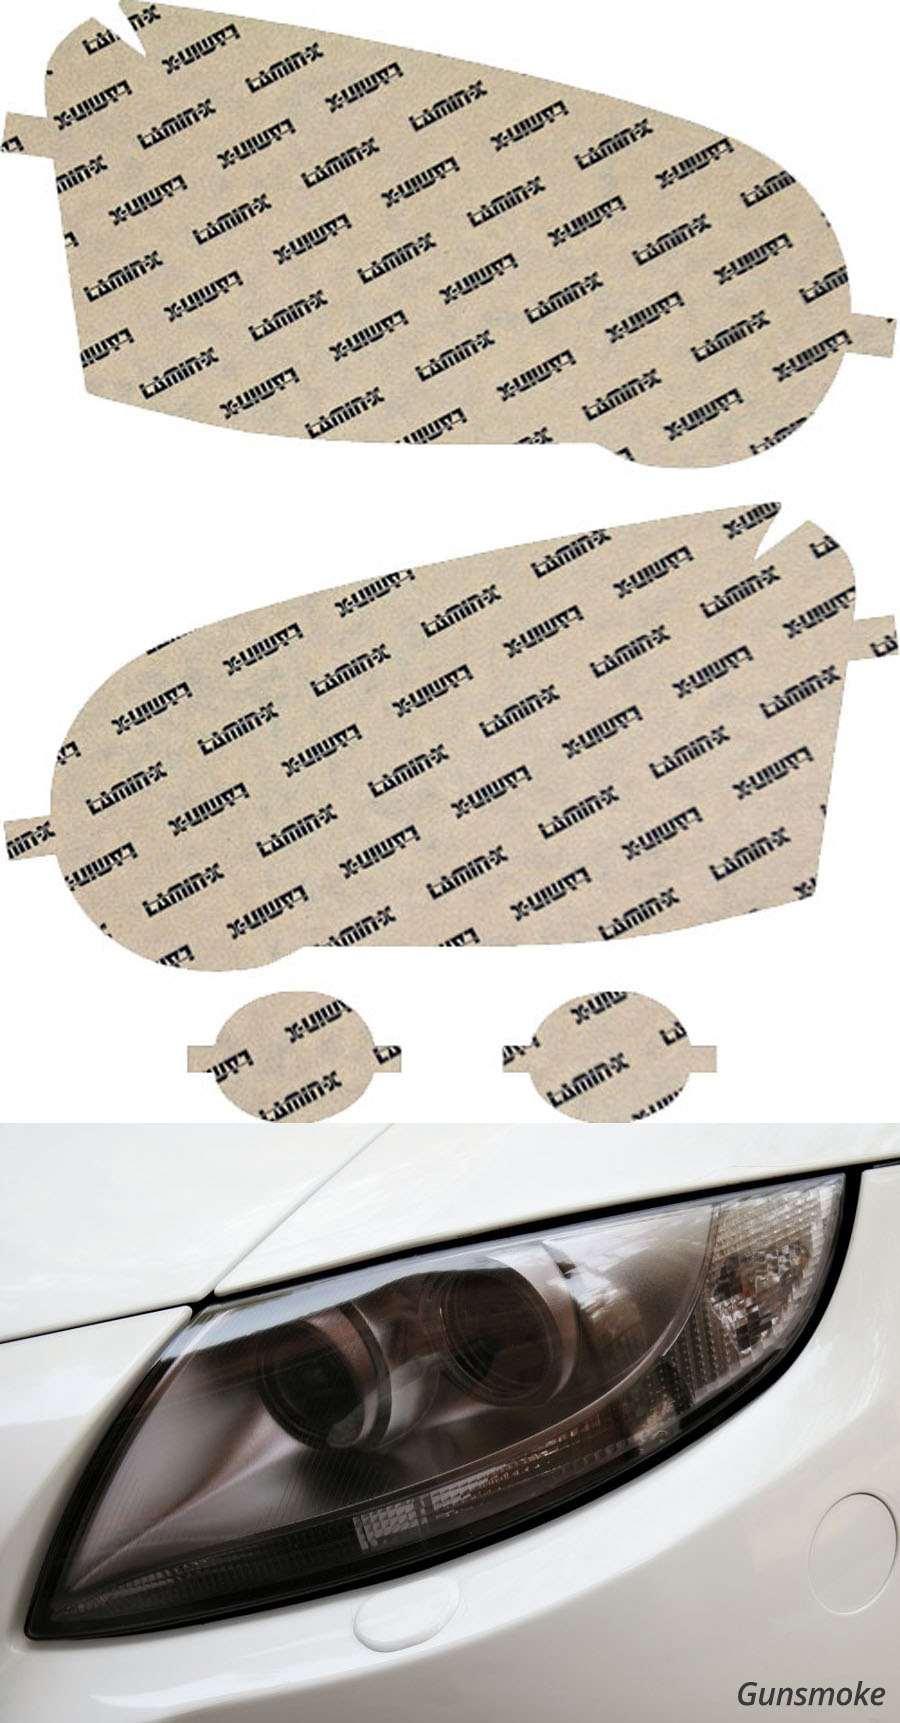 Subaru Impreza WRX   STI 04-05 Gunsmoke Lighting Covers Lamin-X S004G